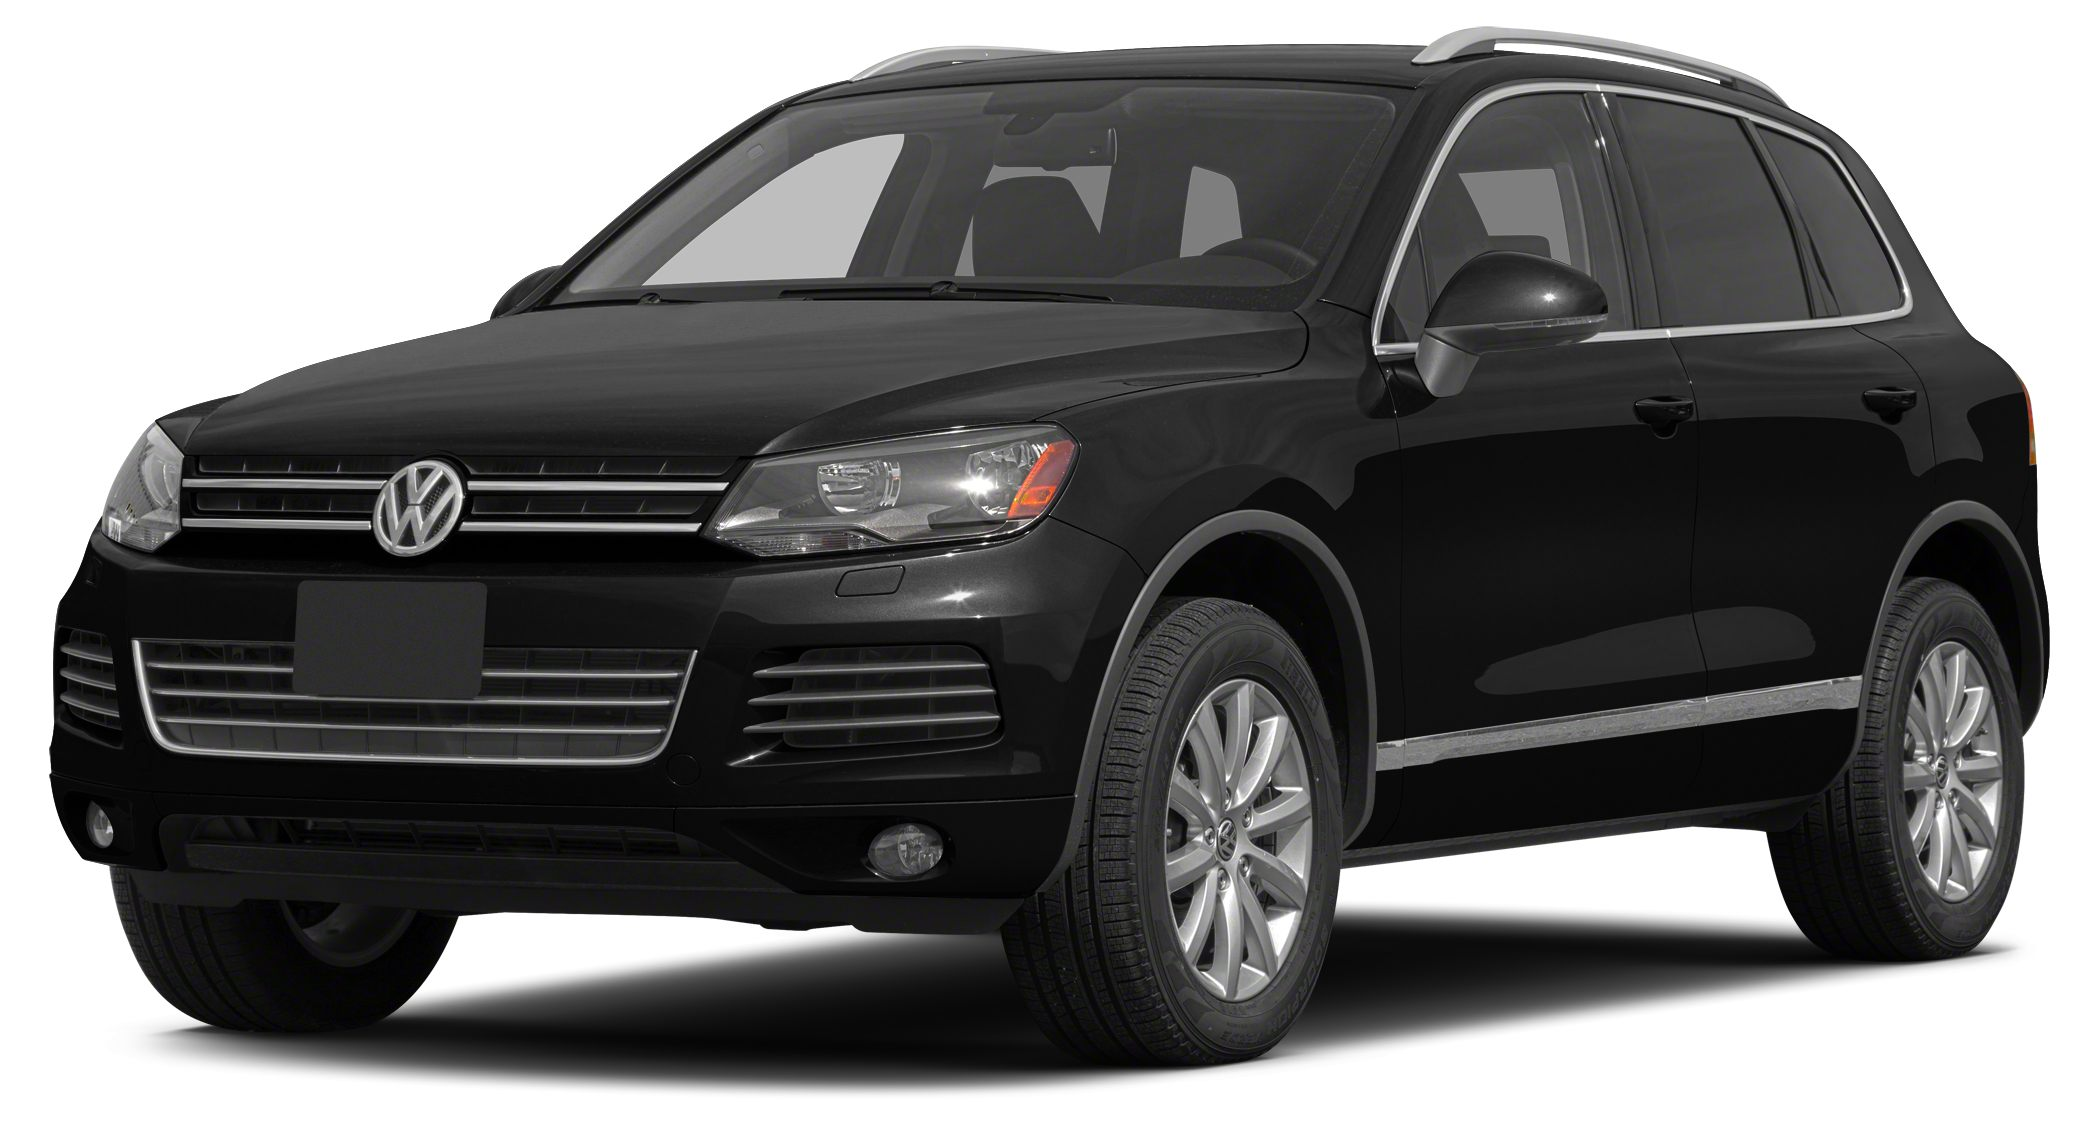 2014 Volkswagen Touareg  VOLKSWAGEN CERTIFIED2 YEAR24000 MILE BUMPER TO BUMPER WARRANTYBUY WI